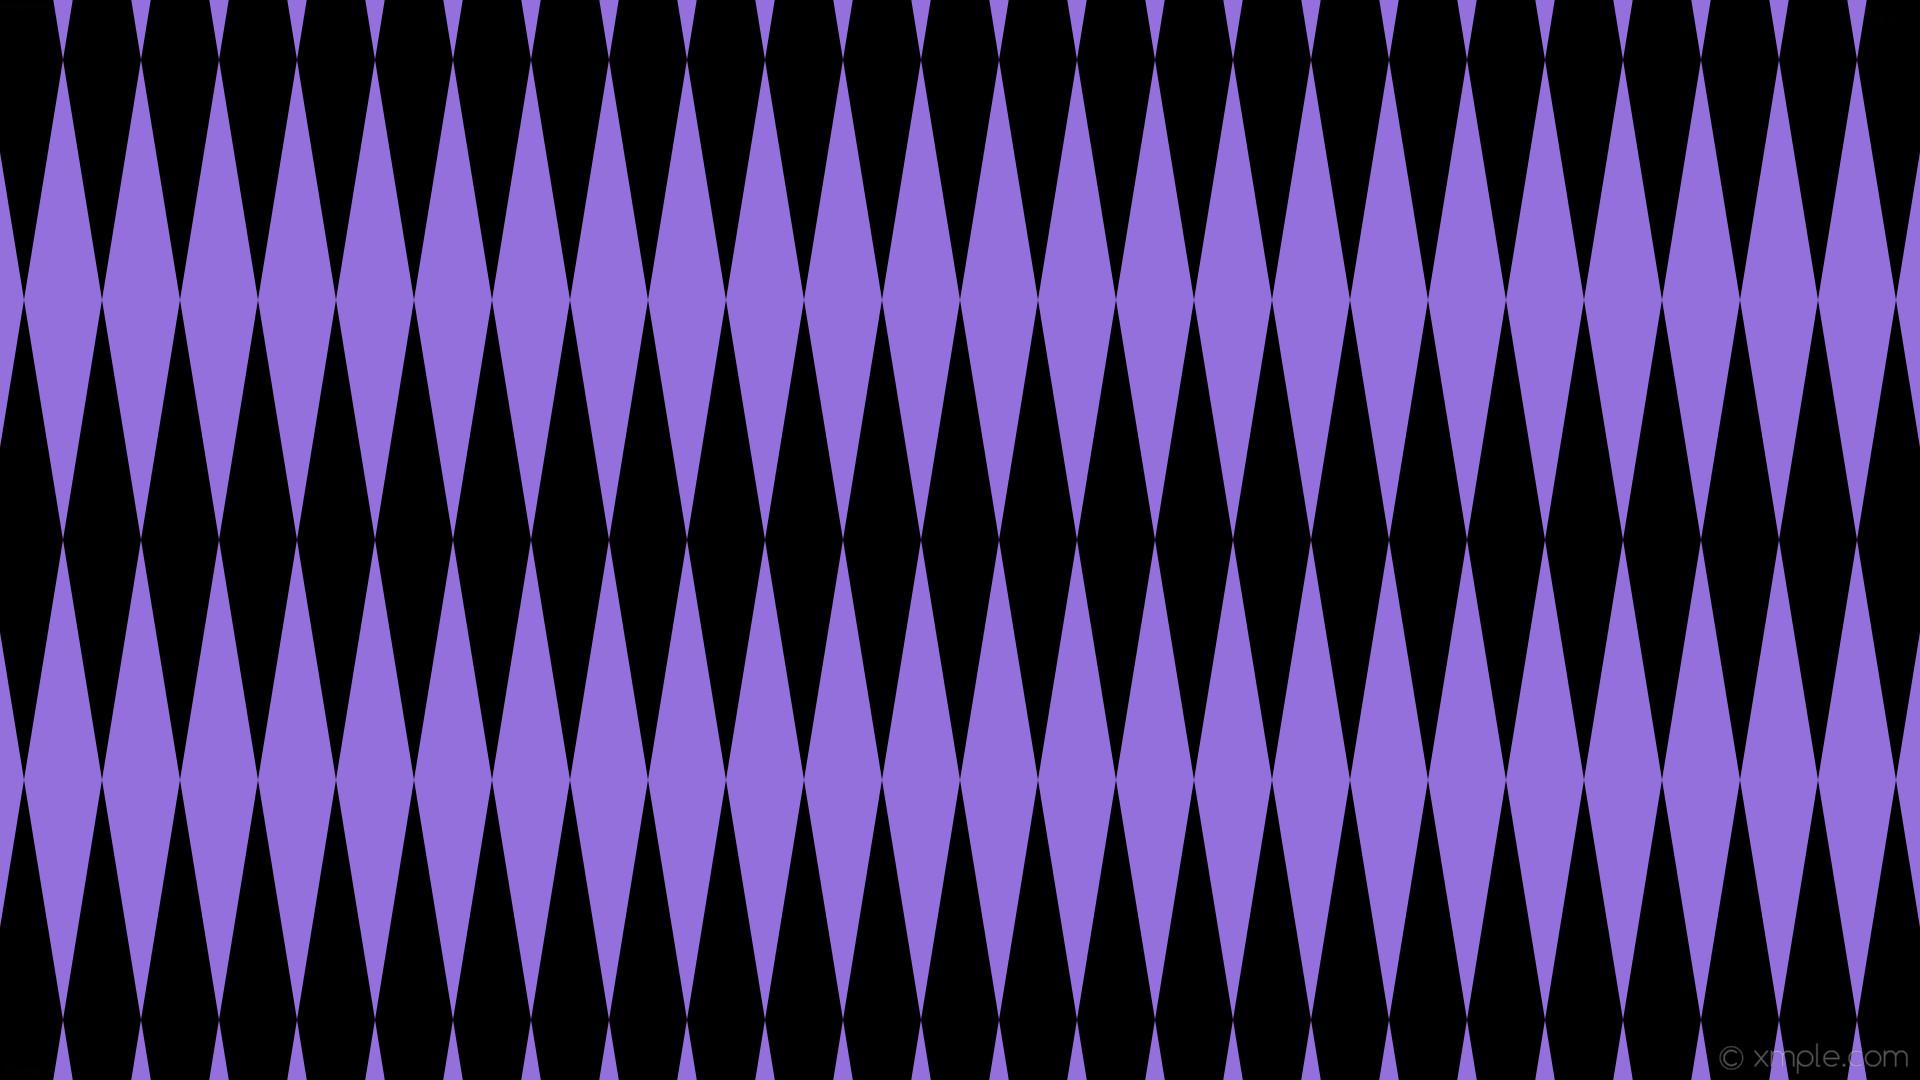 wallpaper rhombus lozenge purple diamond black medium purple #000000  #9370db 90° 480px 78px